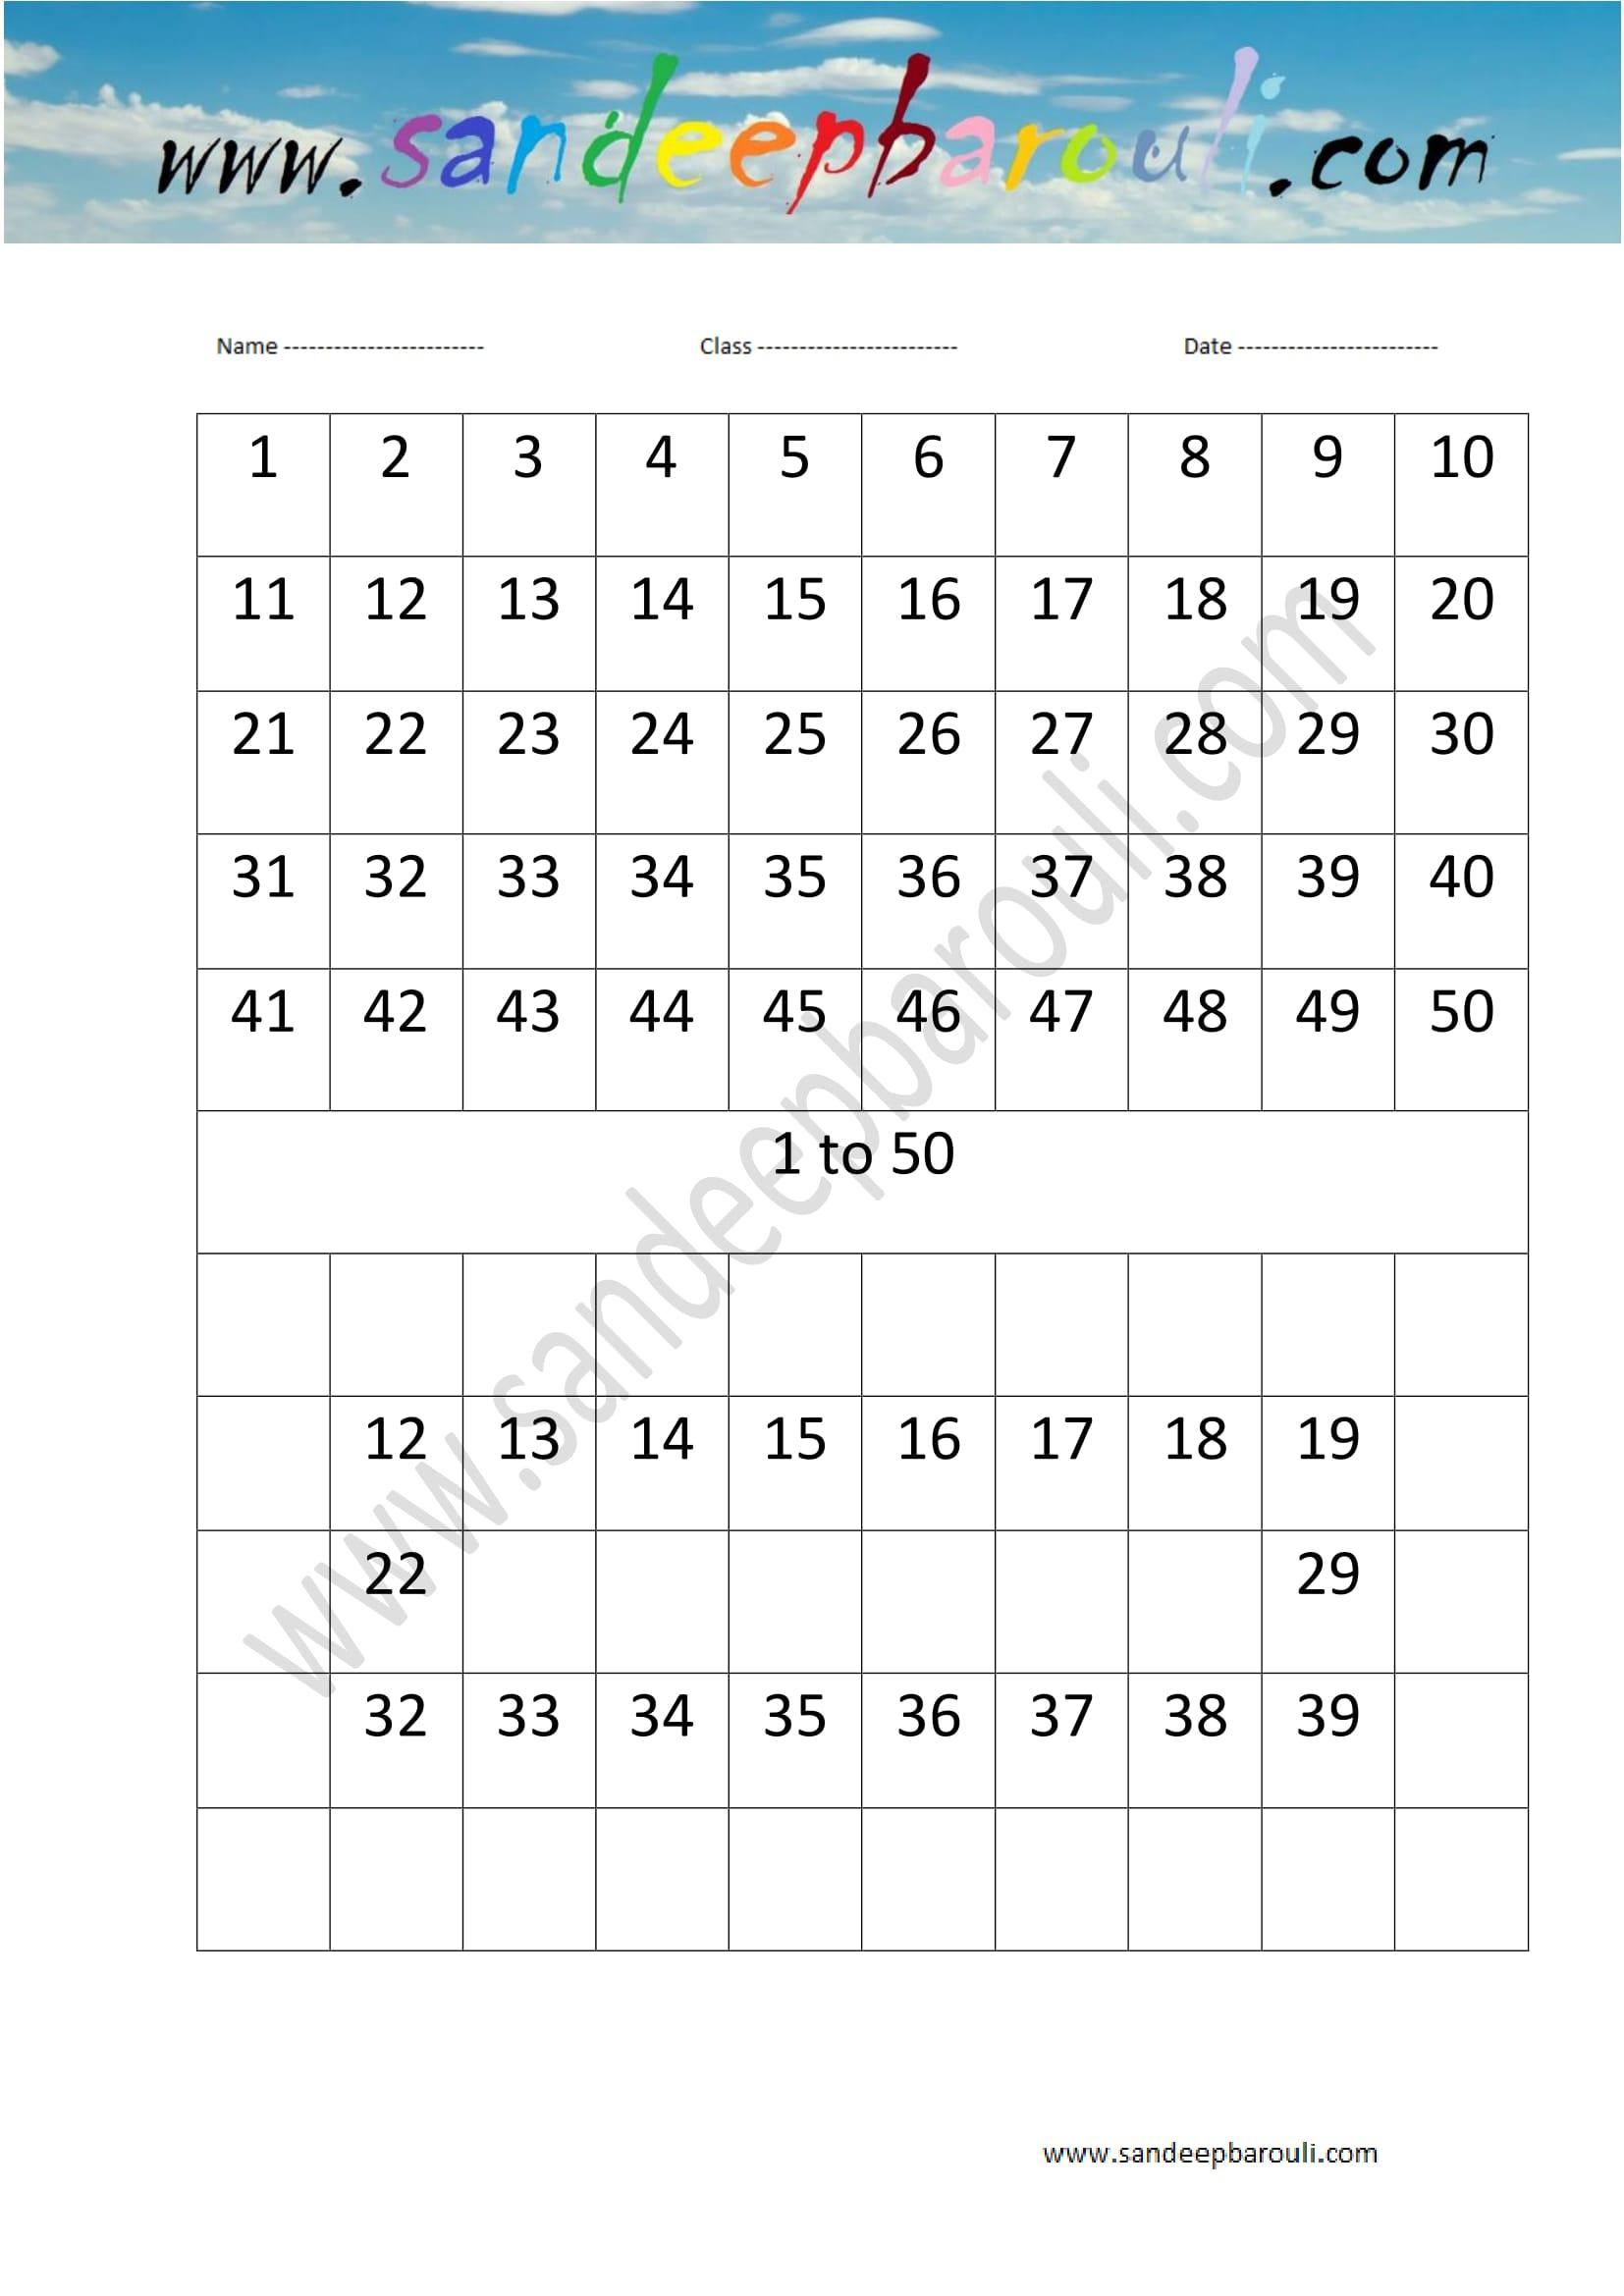 Math Worksheets For Kids 34 Sandeepbarouli